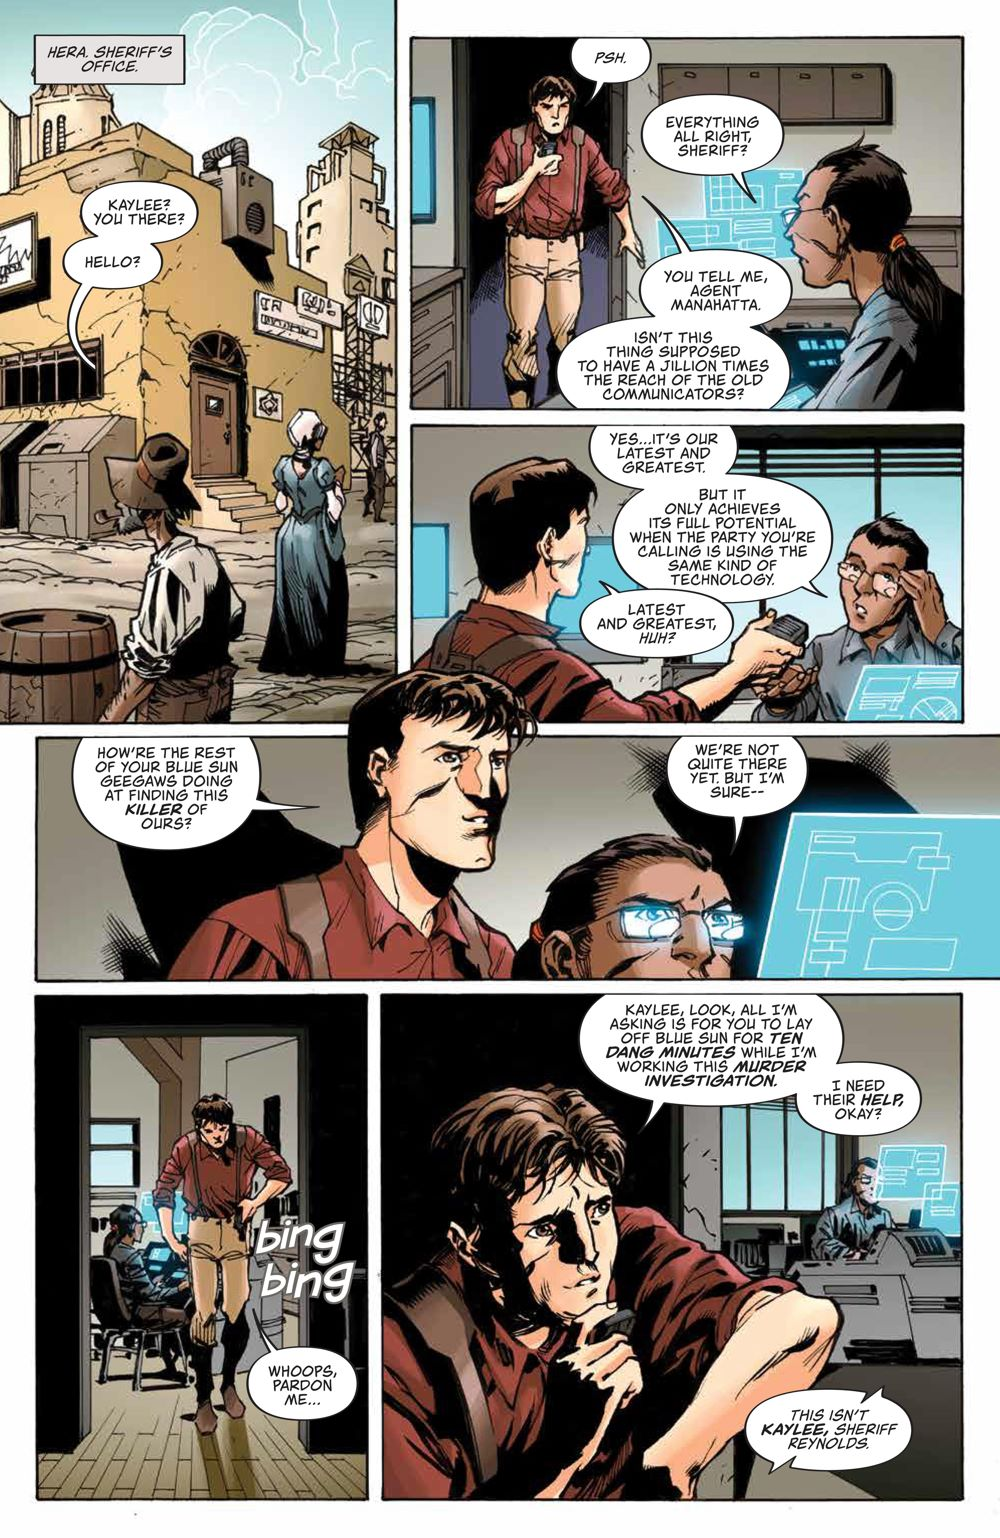 Firefly_NewSheriffVerse_v2_HC_PRESS_13 ComicList Previews: FIREFLY NEW SHERIFF IN THE 'VERSE VOLUME 2 HC